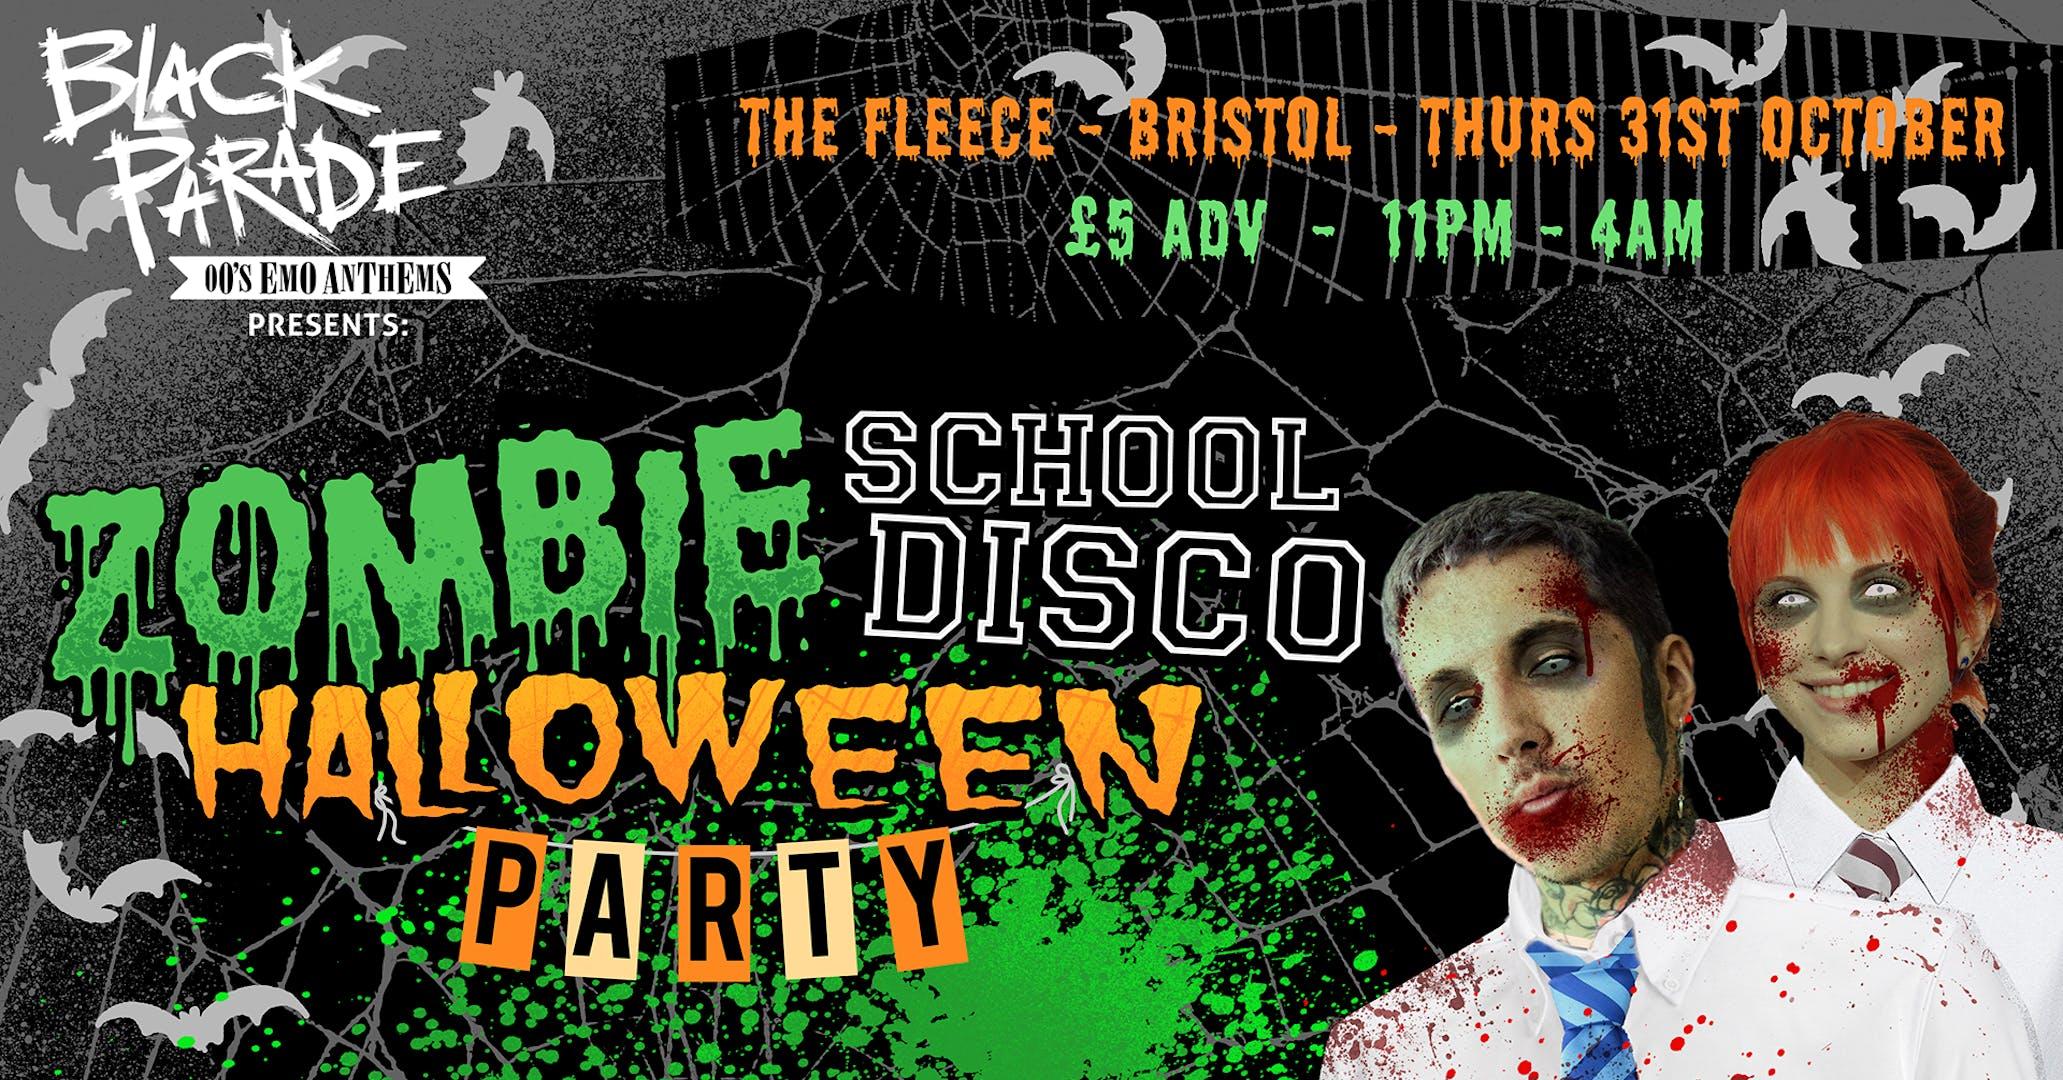 Black Parade presents Halloween Zombie School Disco